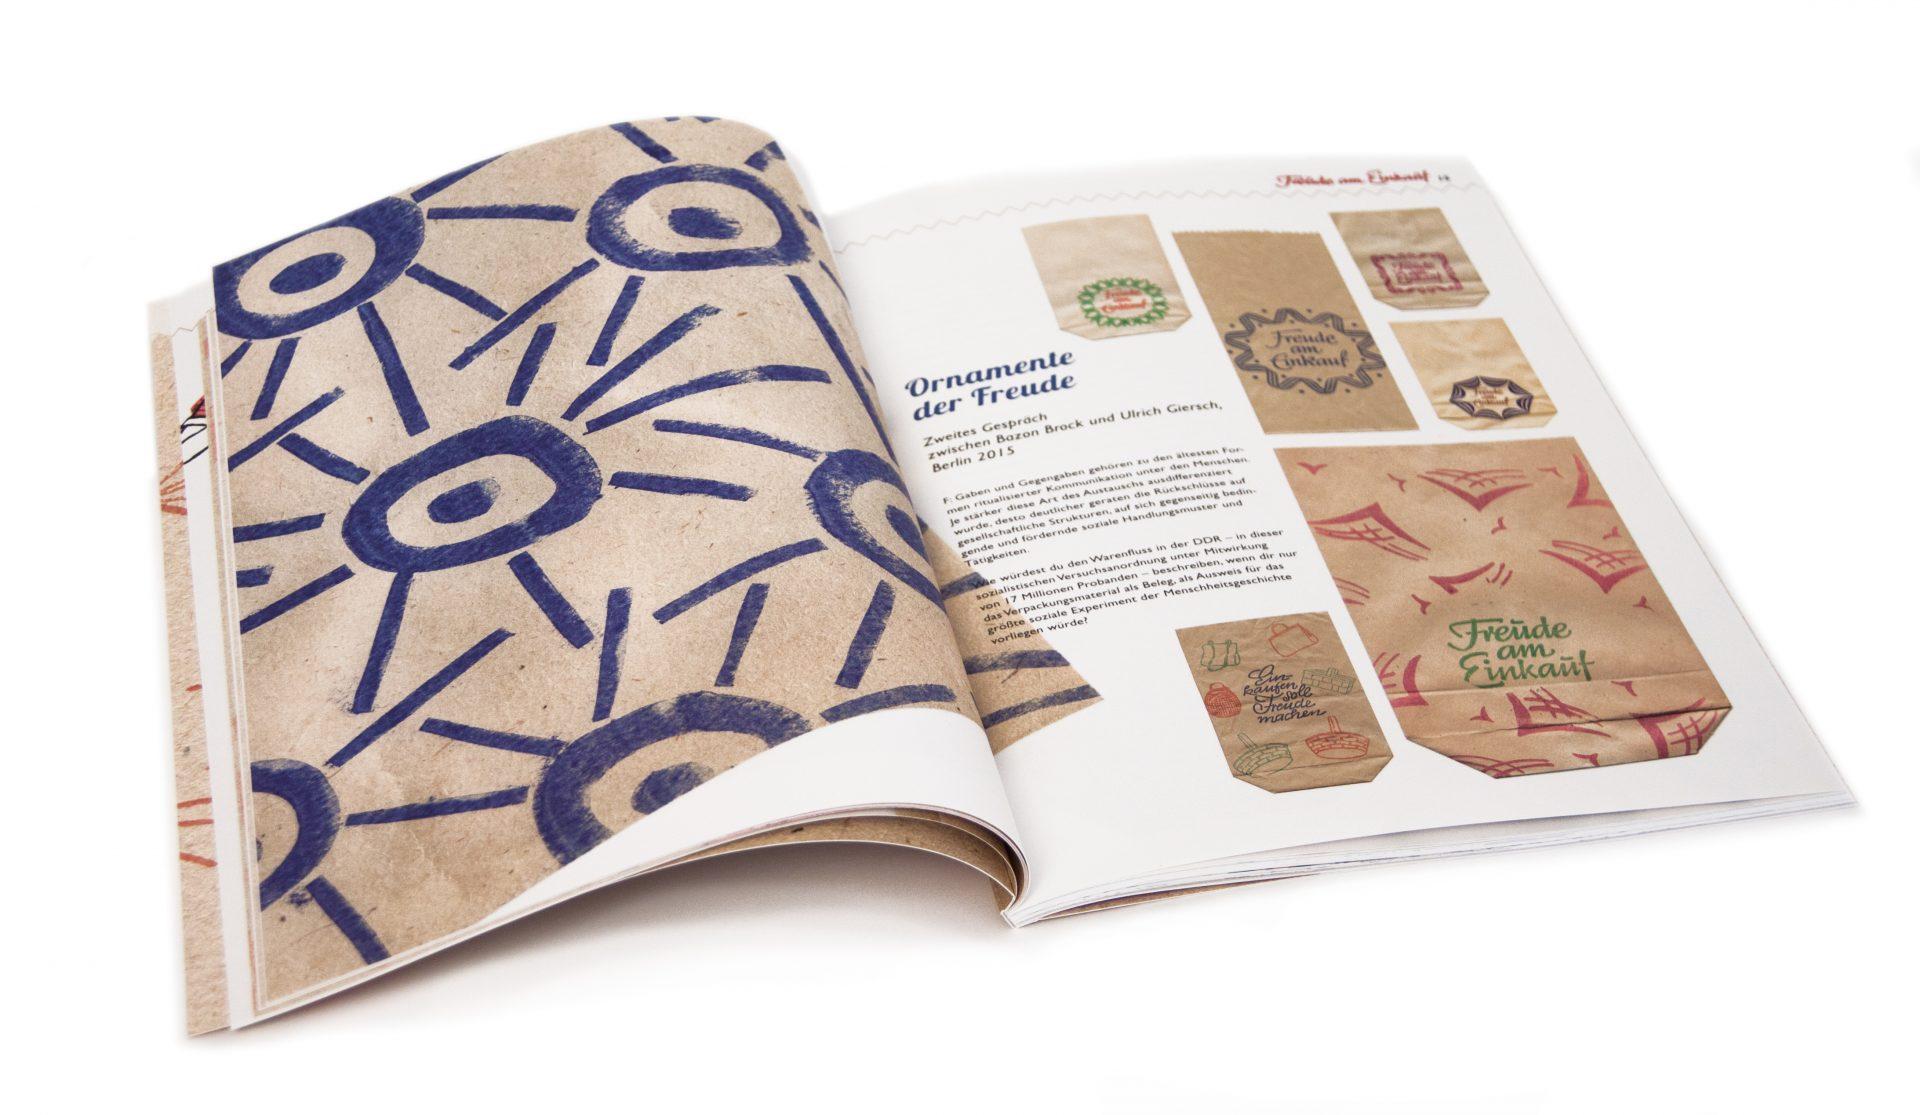 editorialdesign-panorama-ornamentederfreude-copyright-typoly